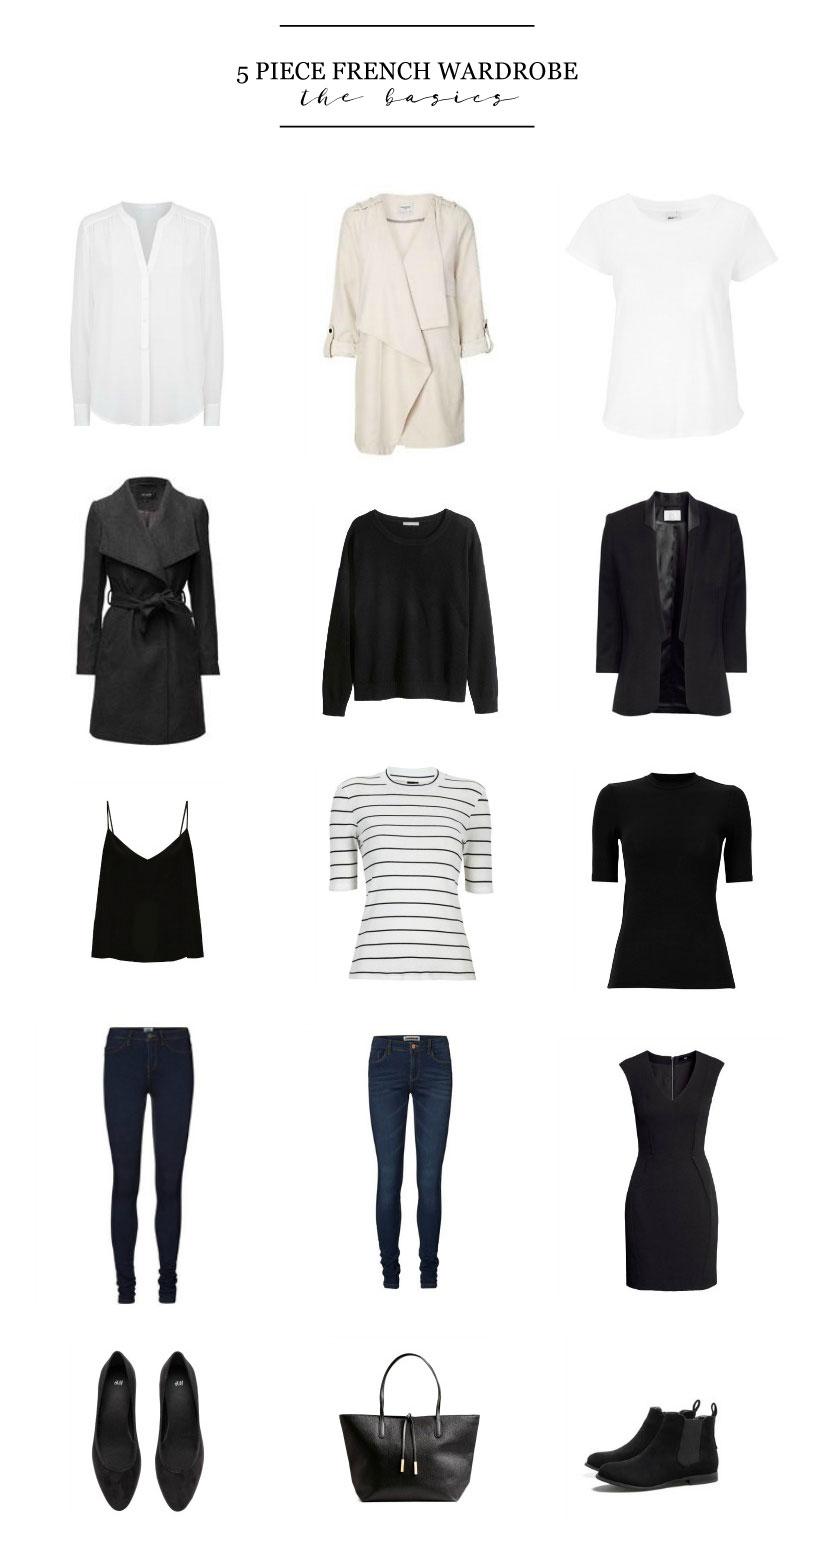 5 Piece French Wardrobe | The Basics